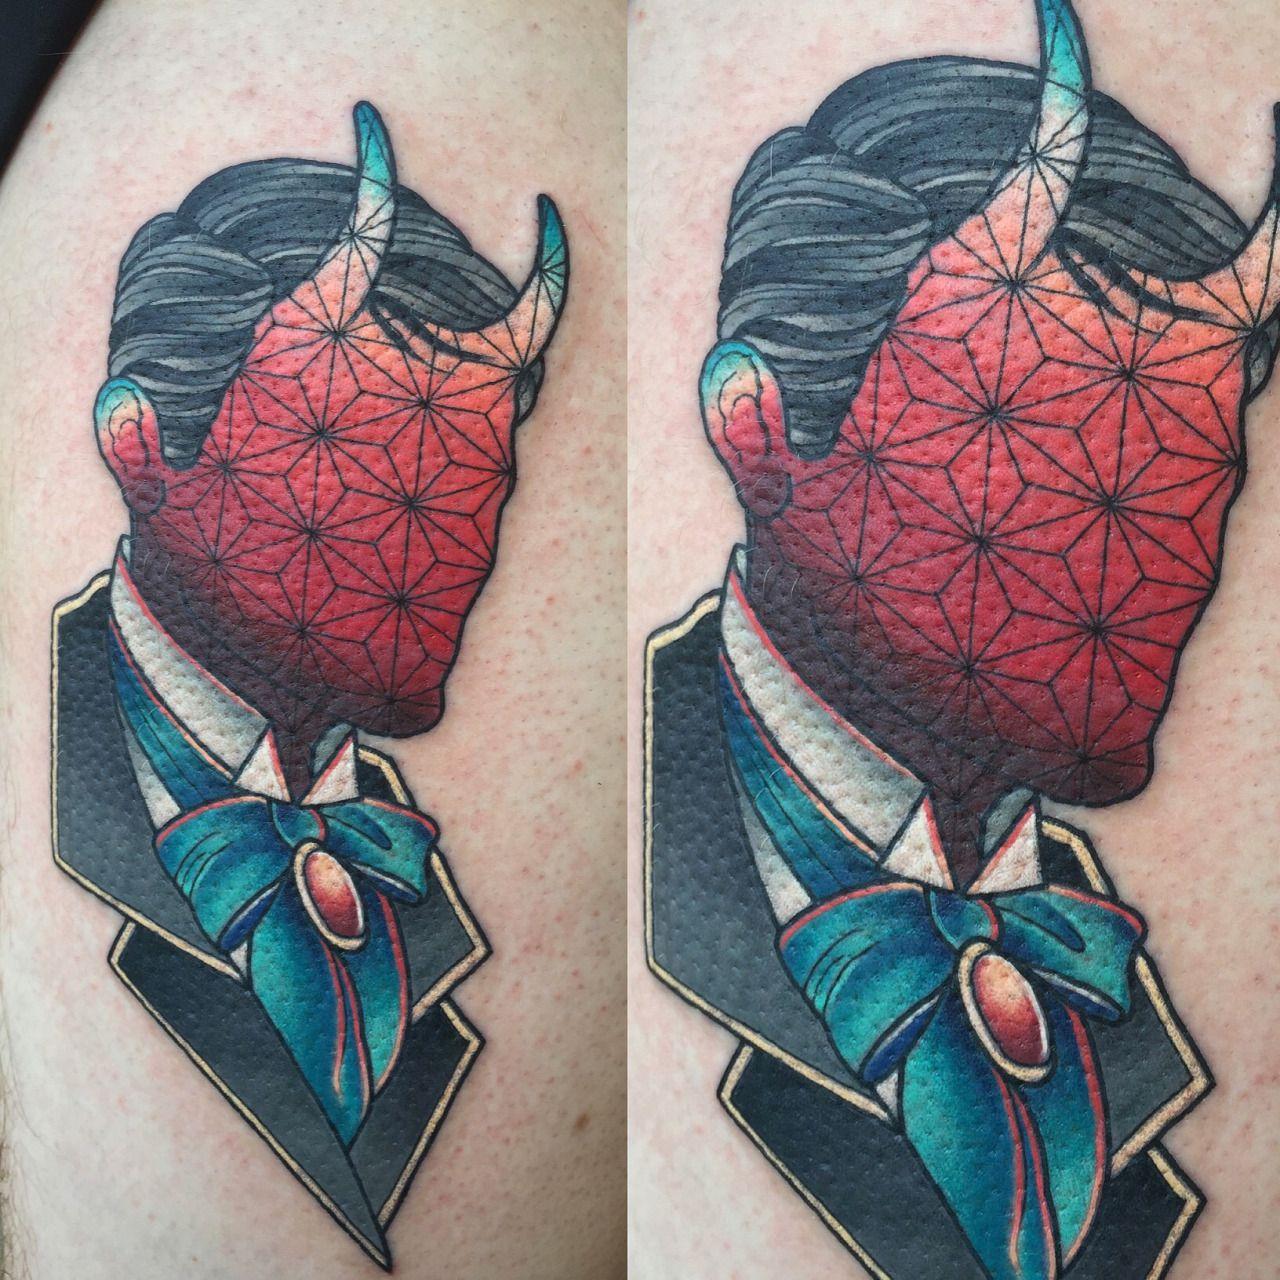 Tattoo by Jay joree in Dallas Texas  Http://www.instagram.com/jayjoree   Http://www.facebook.com/jayjoreetattoos